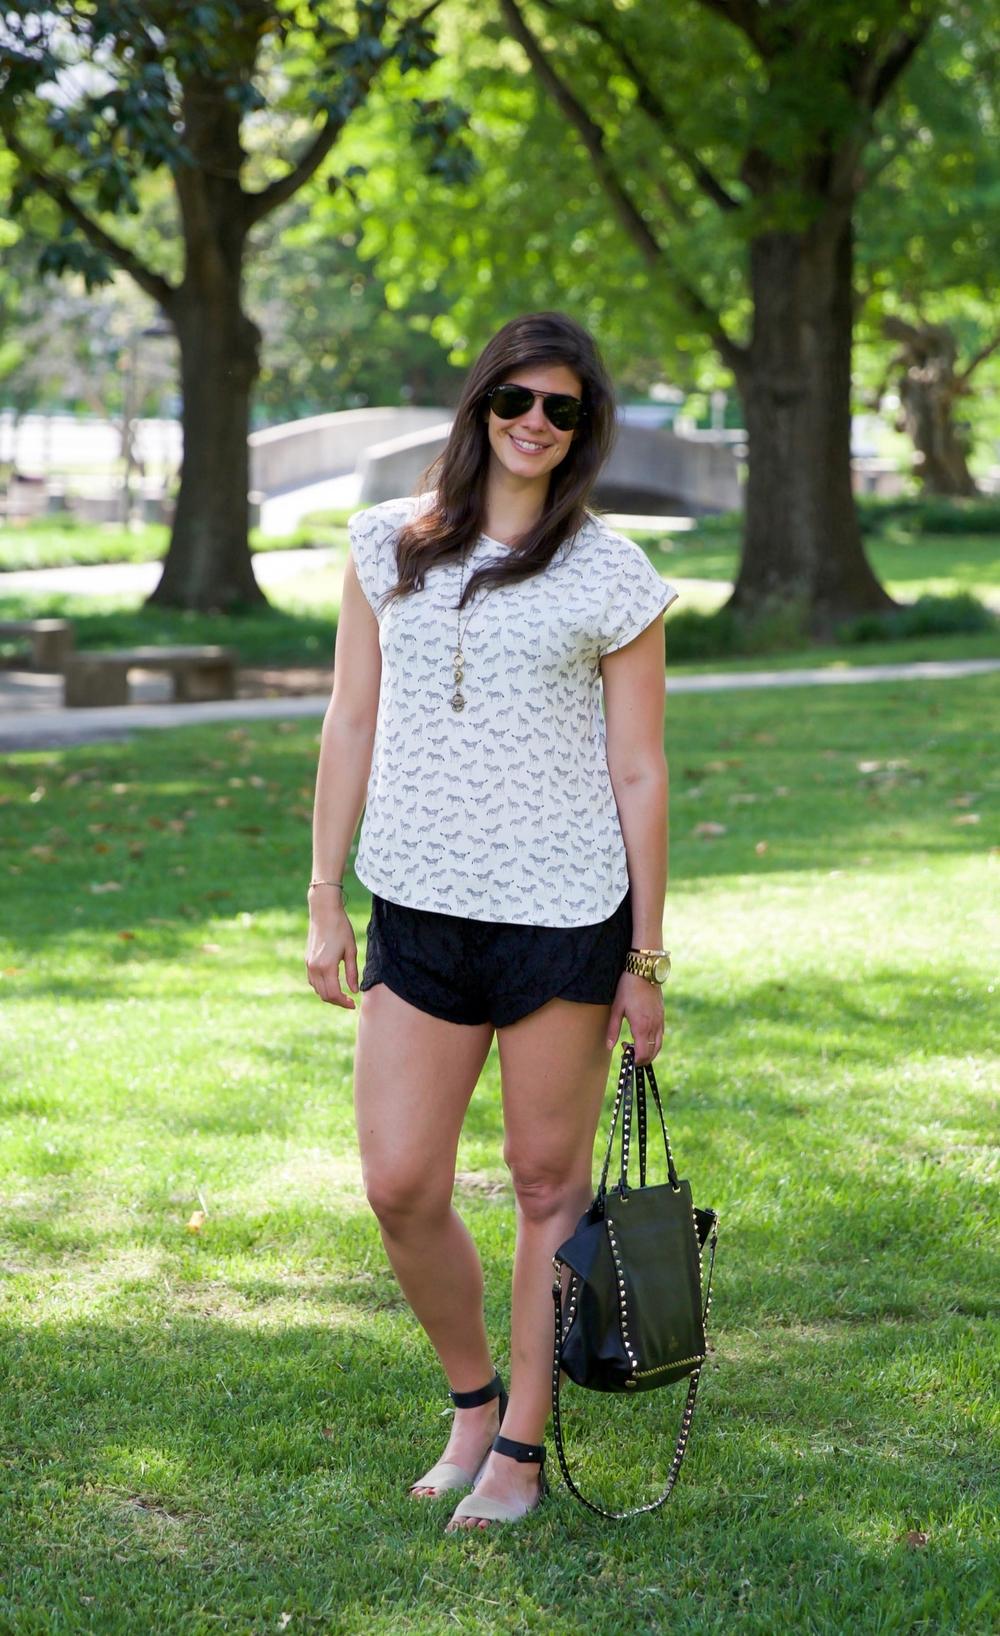 LaurenSchwaiger-Life-Style-Blog-Casual-Summer-Style,jpg